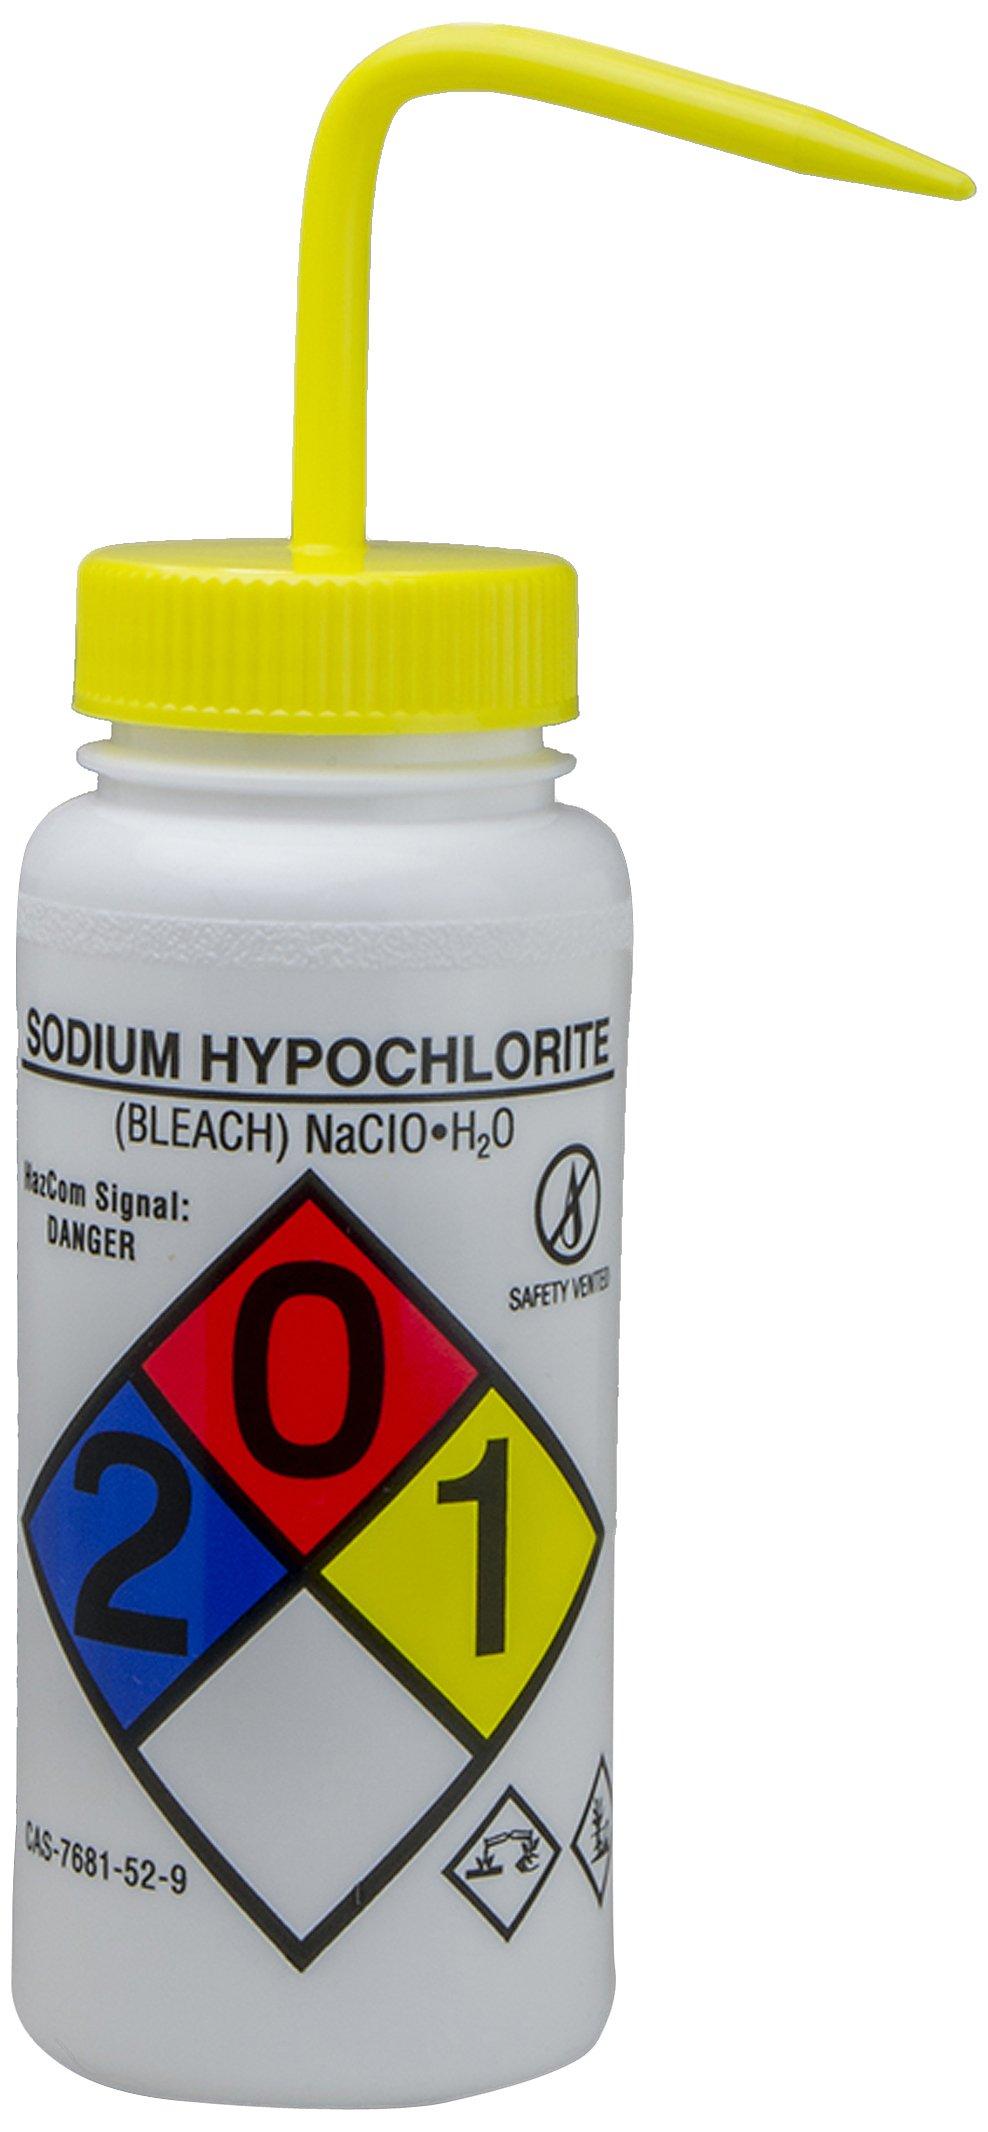 Bel-Art GHS Labeled Safety-Vented Sodium Hypochlorite (Bleach) Wash Bottles; 500ml (16oz), Polyethylene w/Yellow Polypropylene Cap (Pack of 4) (F12416-0015)